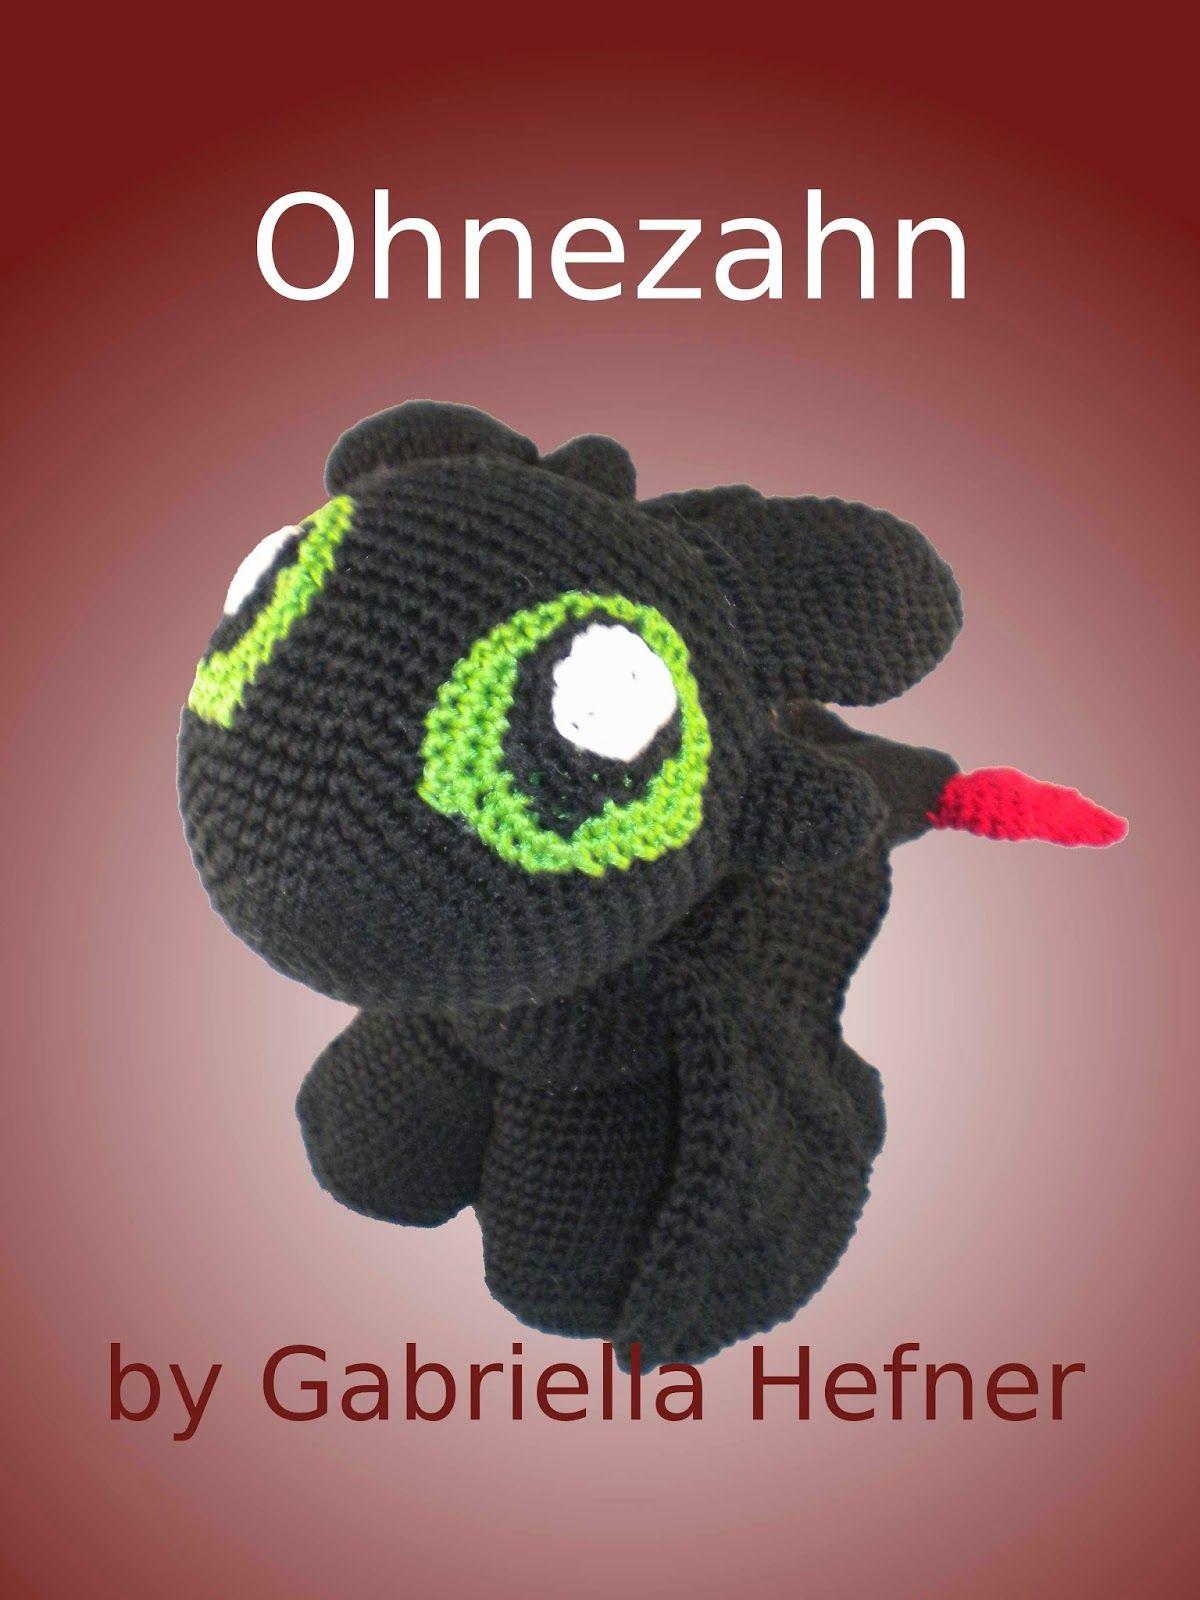 Ohnezahn Amigurumies By Gabriella Hefner Mika Amigurumi